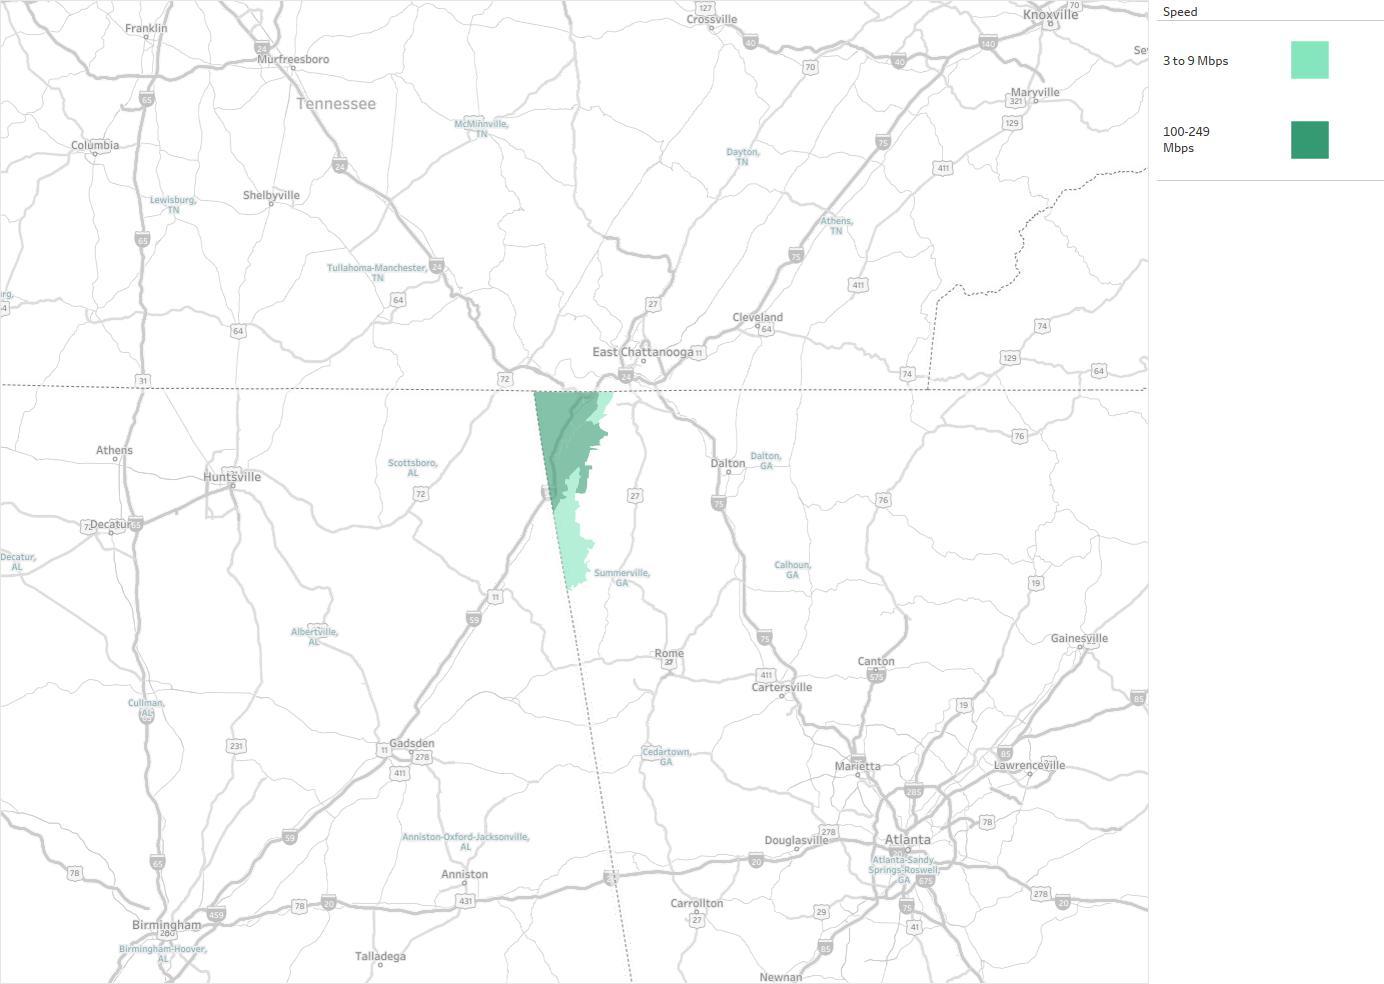 Trenton Telephone Company Availability Areas Coverage Map